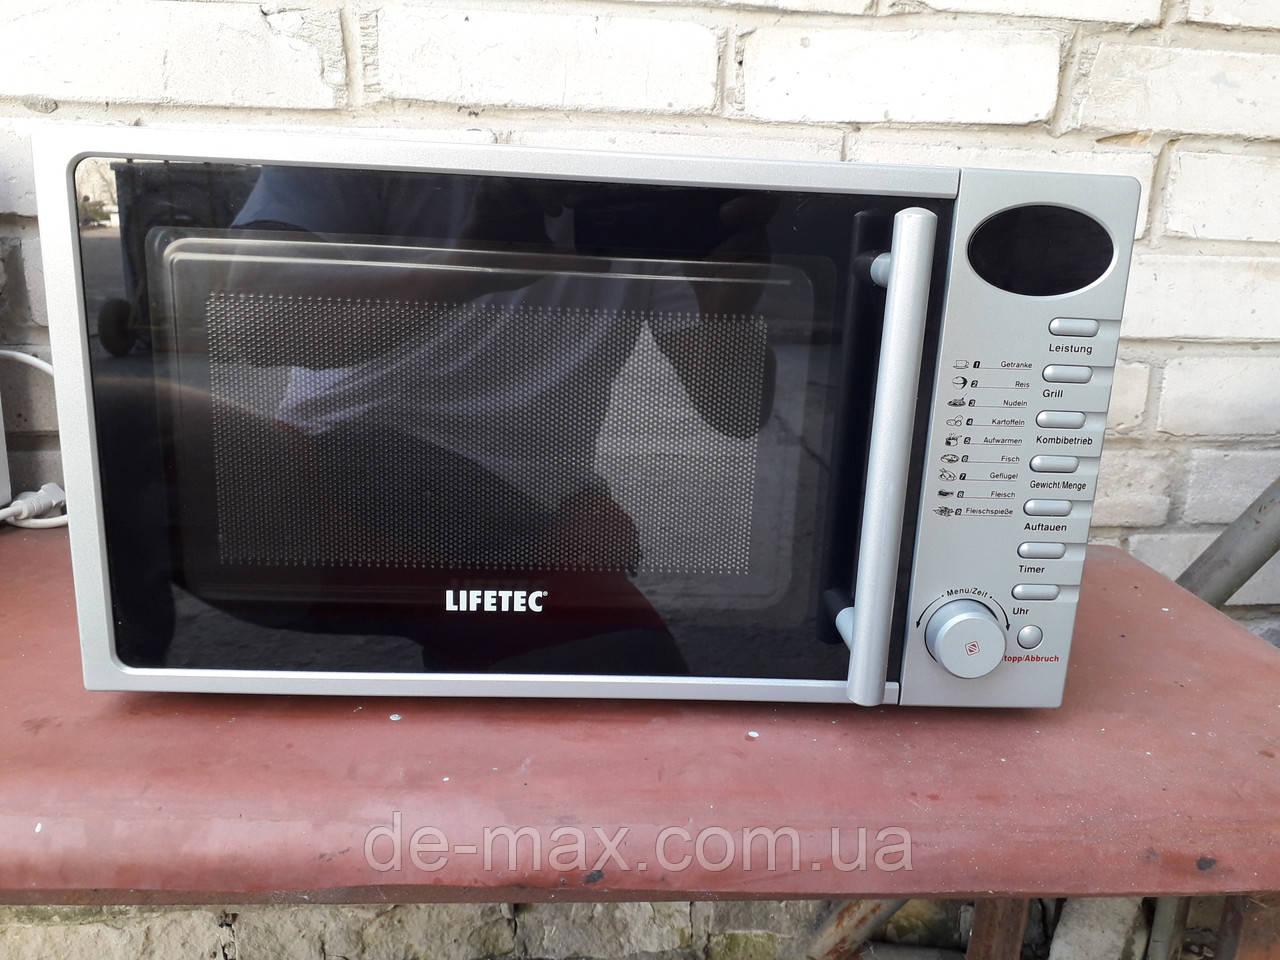 Микроволновая печь мікрохвильова піч СВЧ Lifitec LT 11471 20л 800Вт Гриль